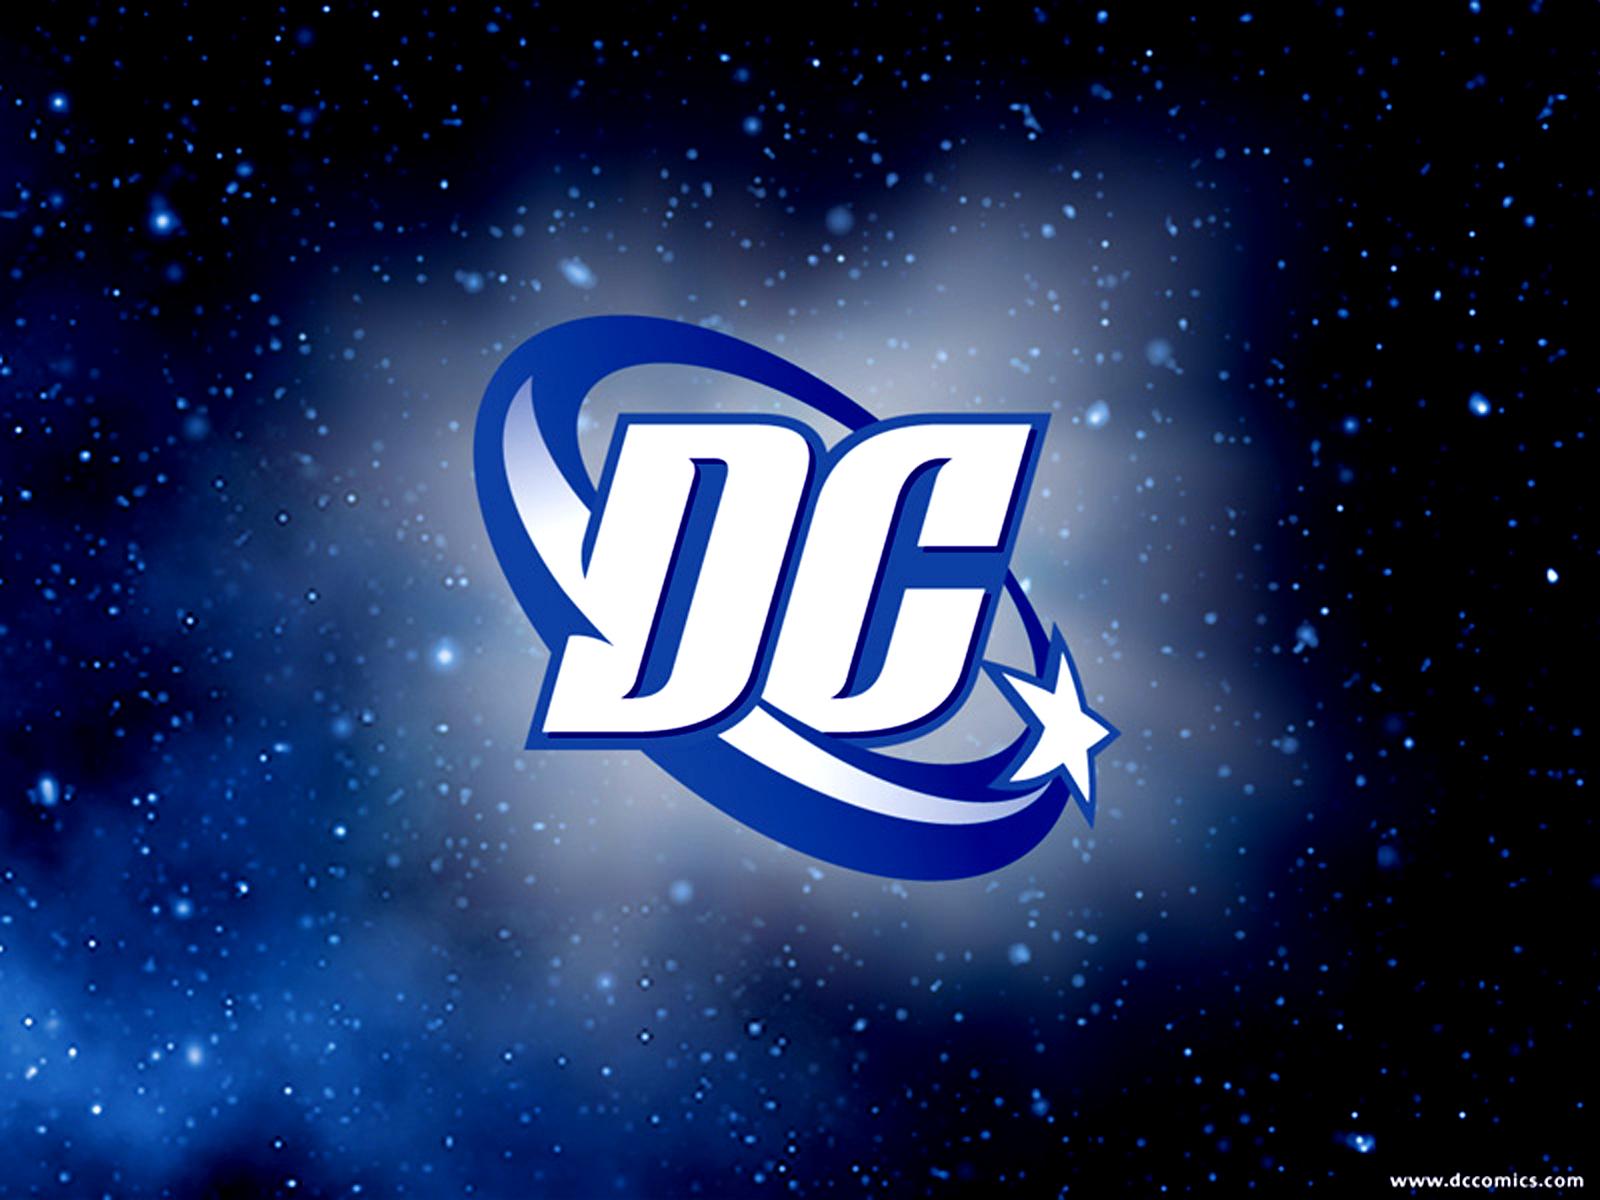 DC Comics All Super Heroes HD Wallpapers Desktop Wallpapers 1600x1200